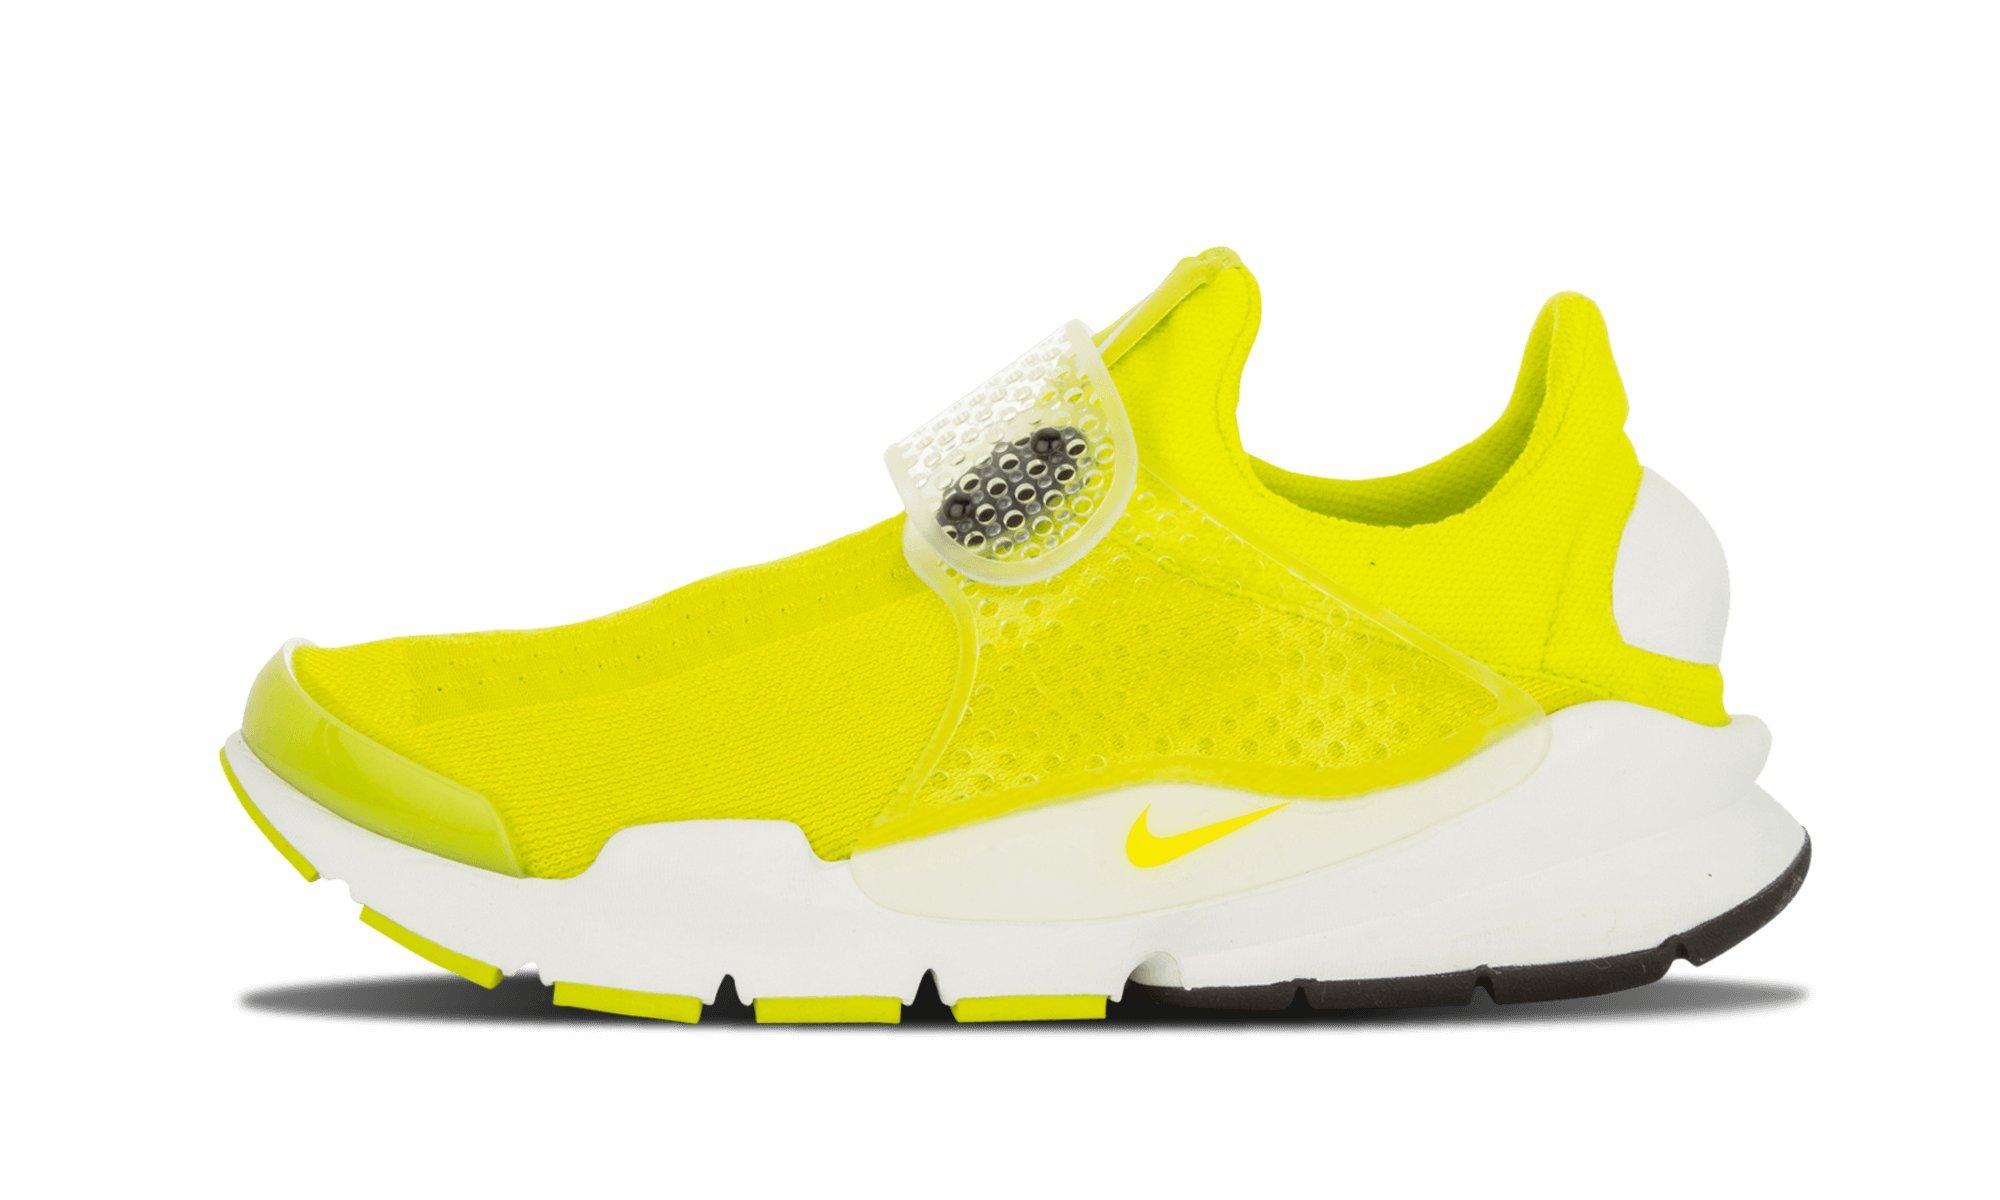 71q4Btddr5L - Nike Men's Sock Dart SP Running Shoes - 686058 771